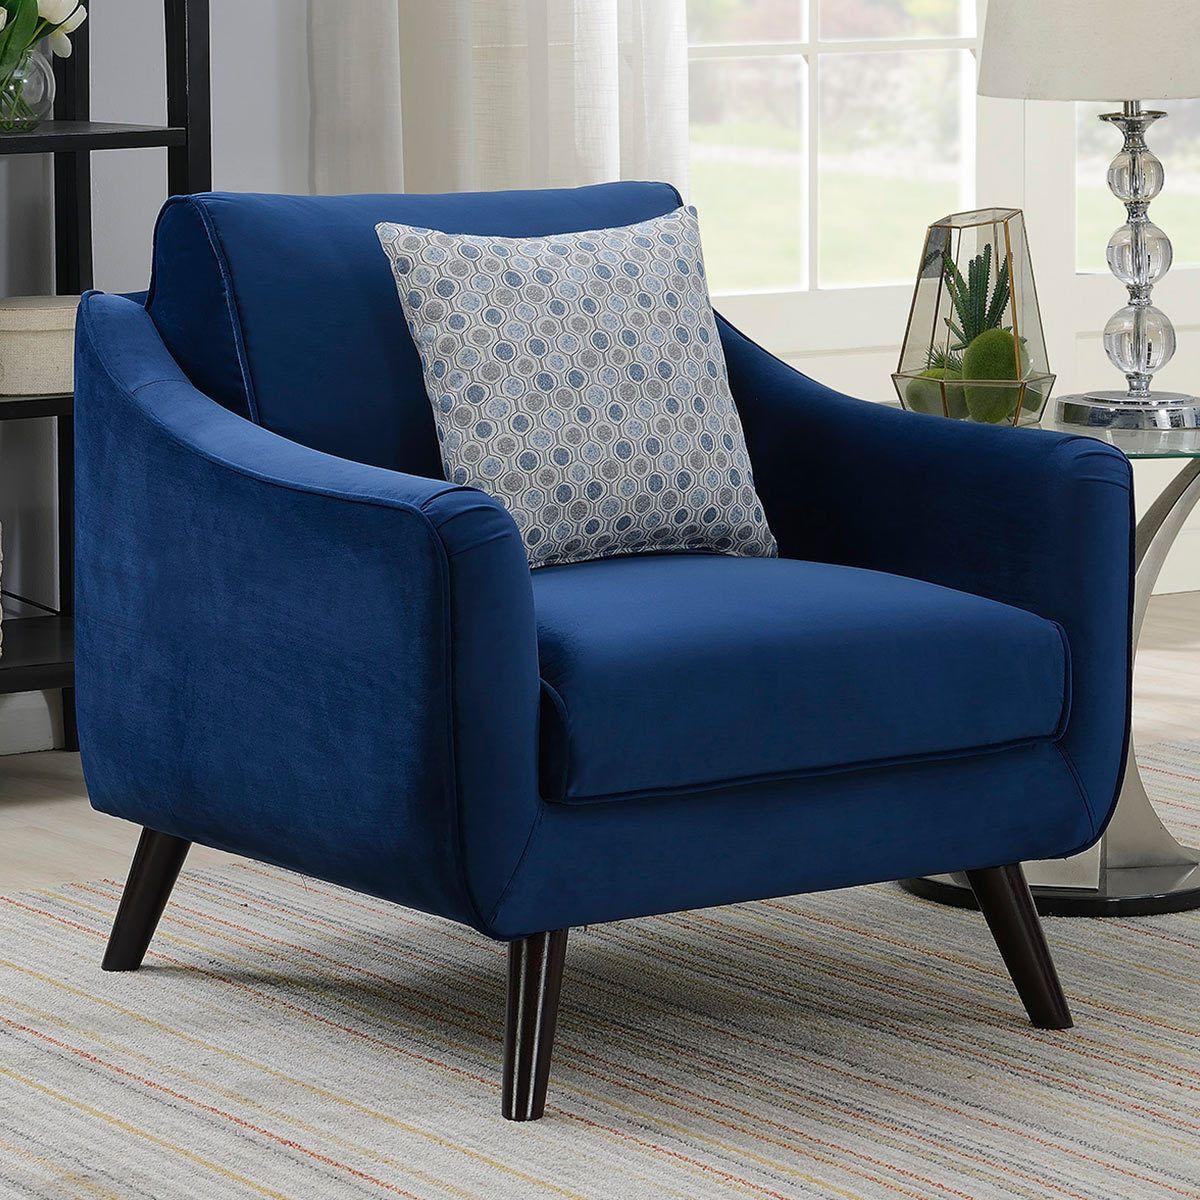 Bainbridge Blue Velvet Armchair Navy Blue Accent Chair Accent